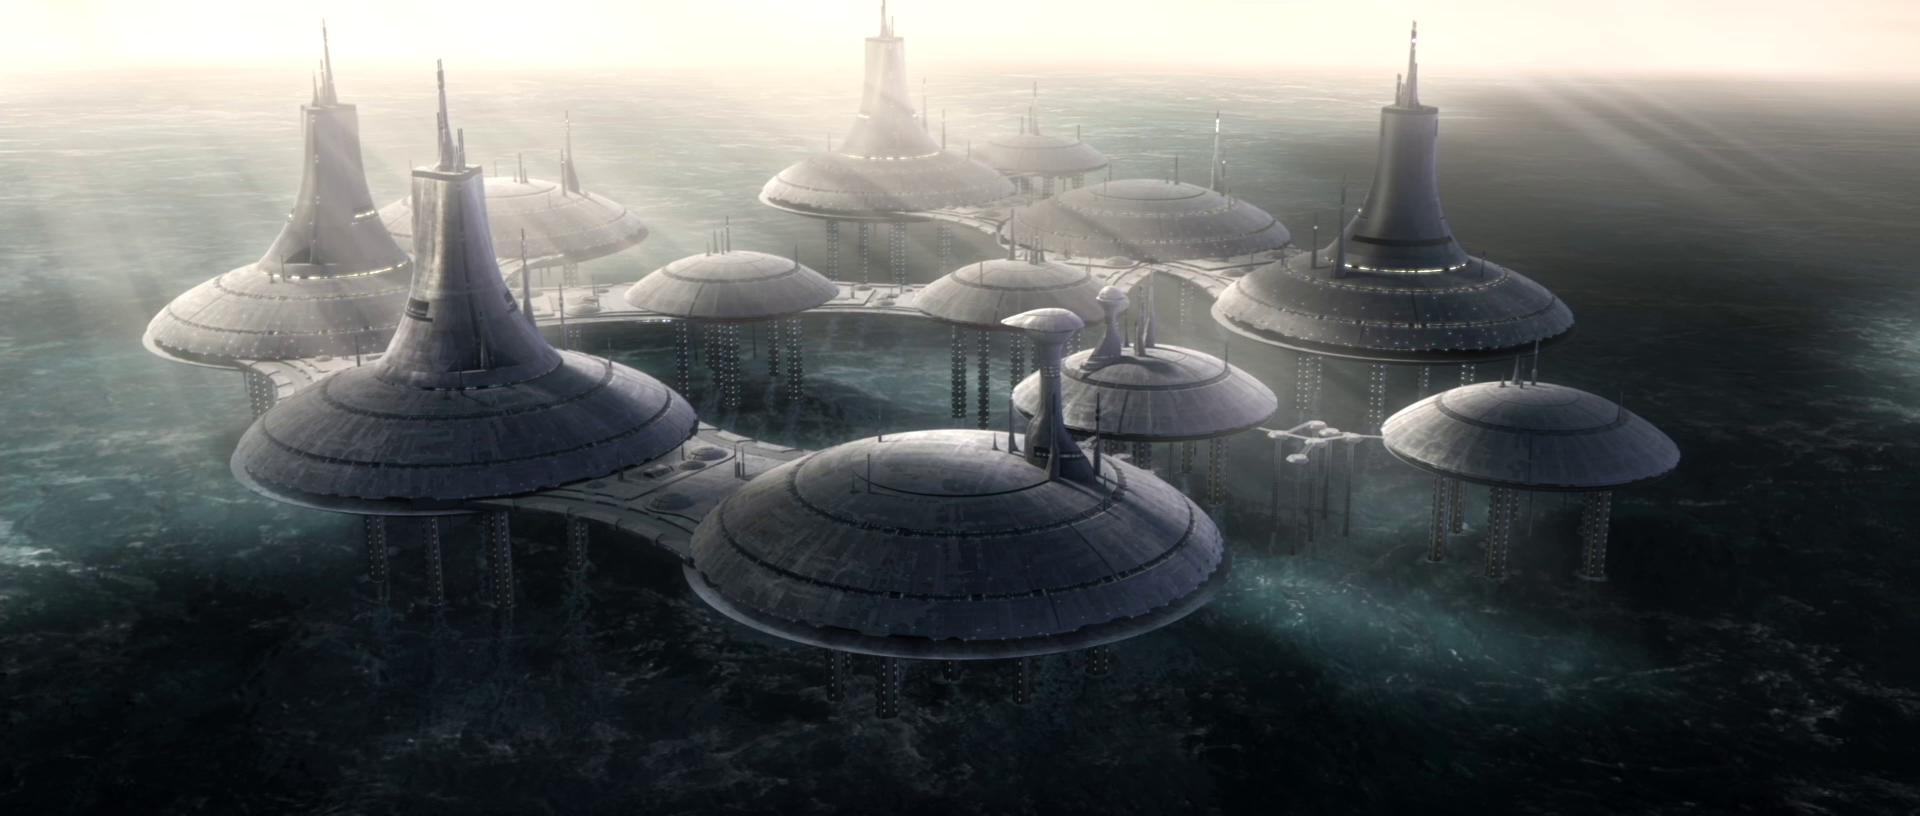 Kamino - Wookieepedia, the Star Wars Wiki Kamino